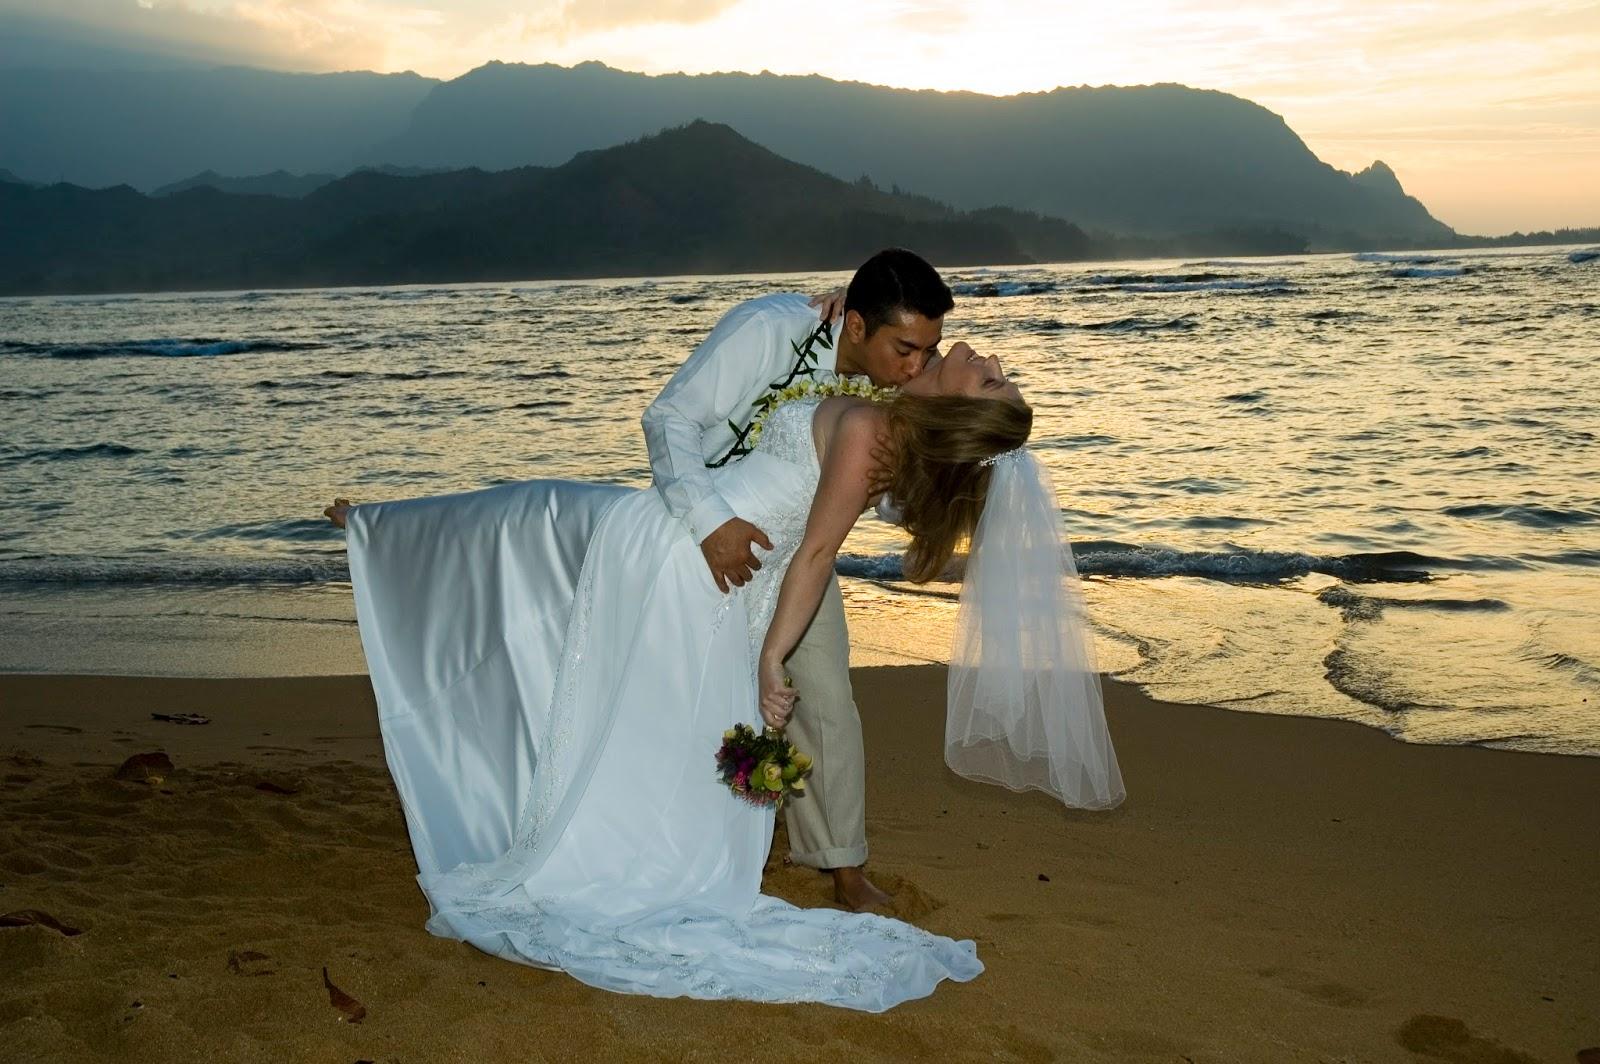 kauai wedding ceremonies tips and insights kauai